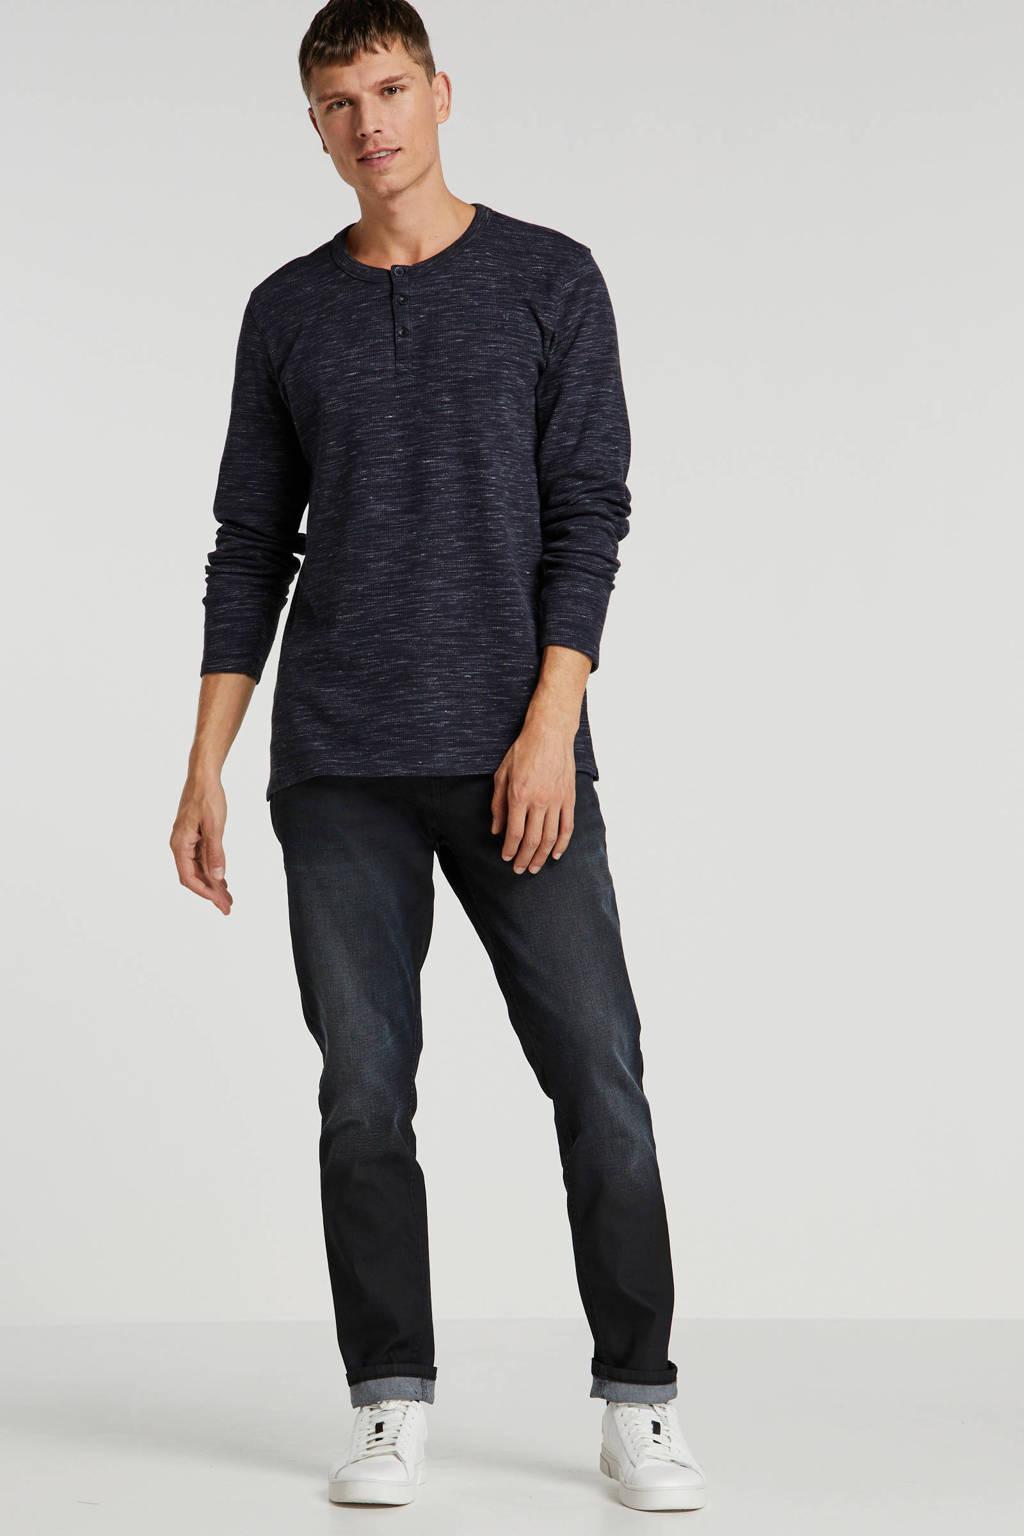 Cars regular fit jeans Henlow 21 black coated, 21 Black Coated